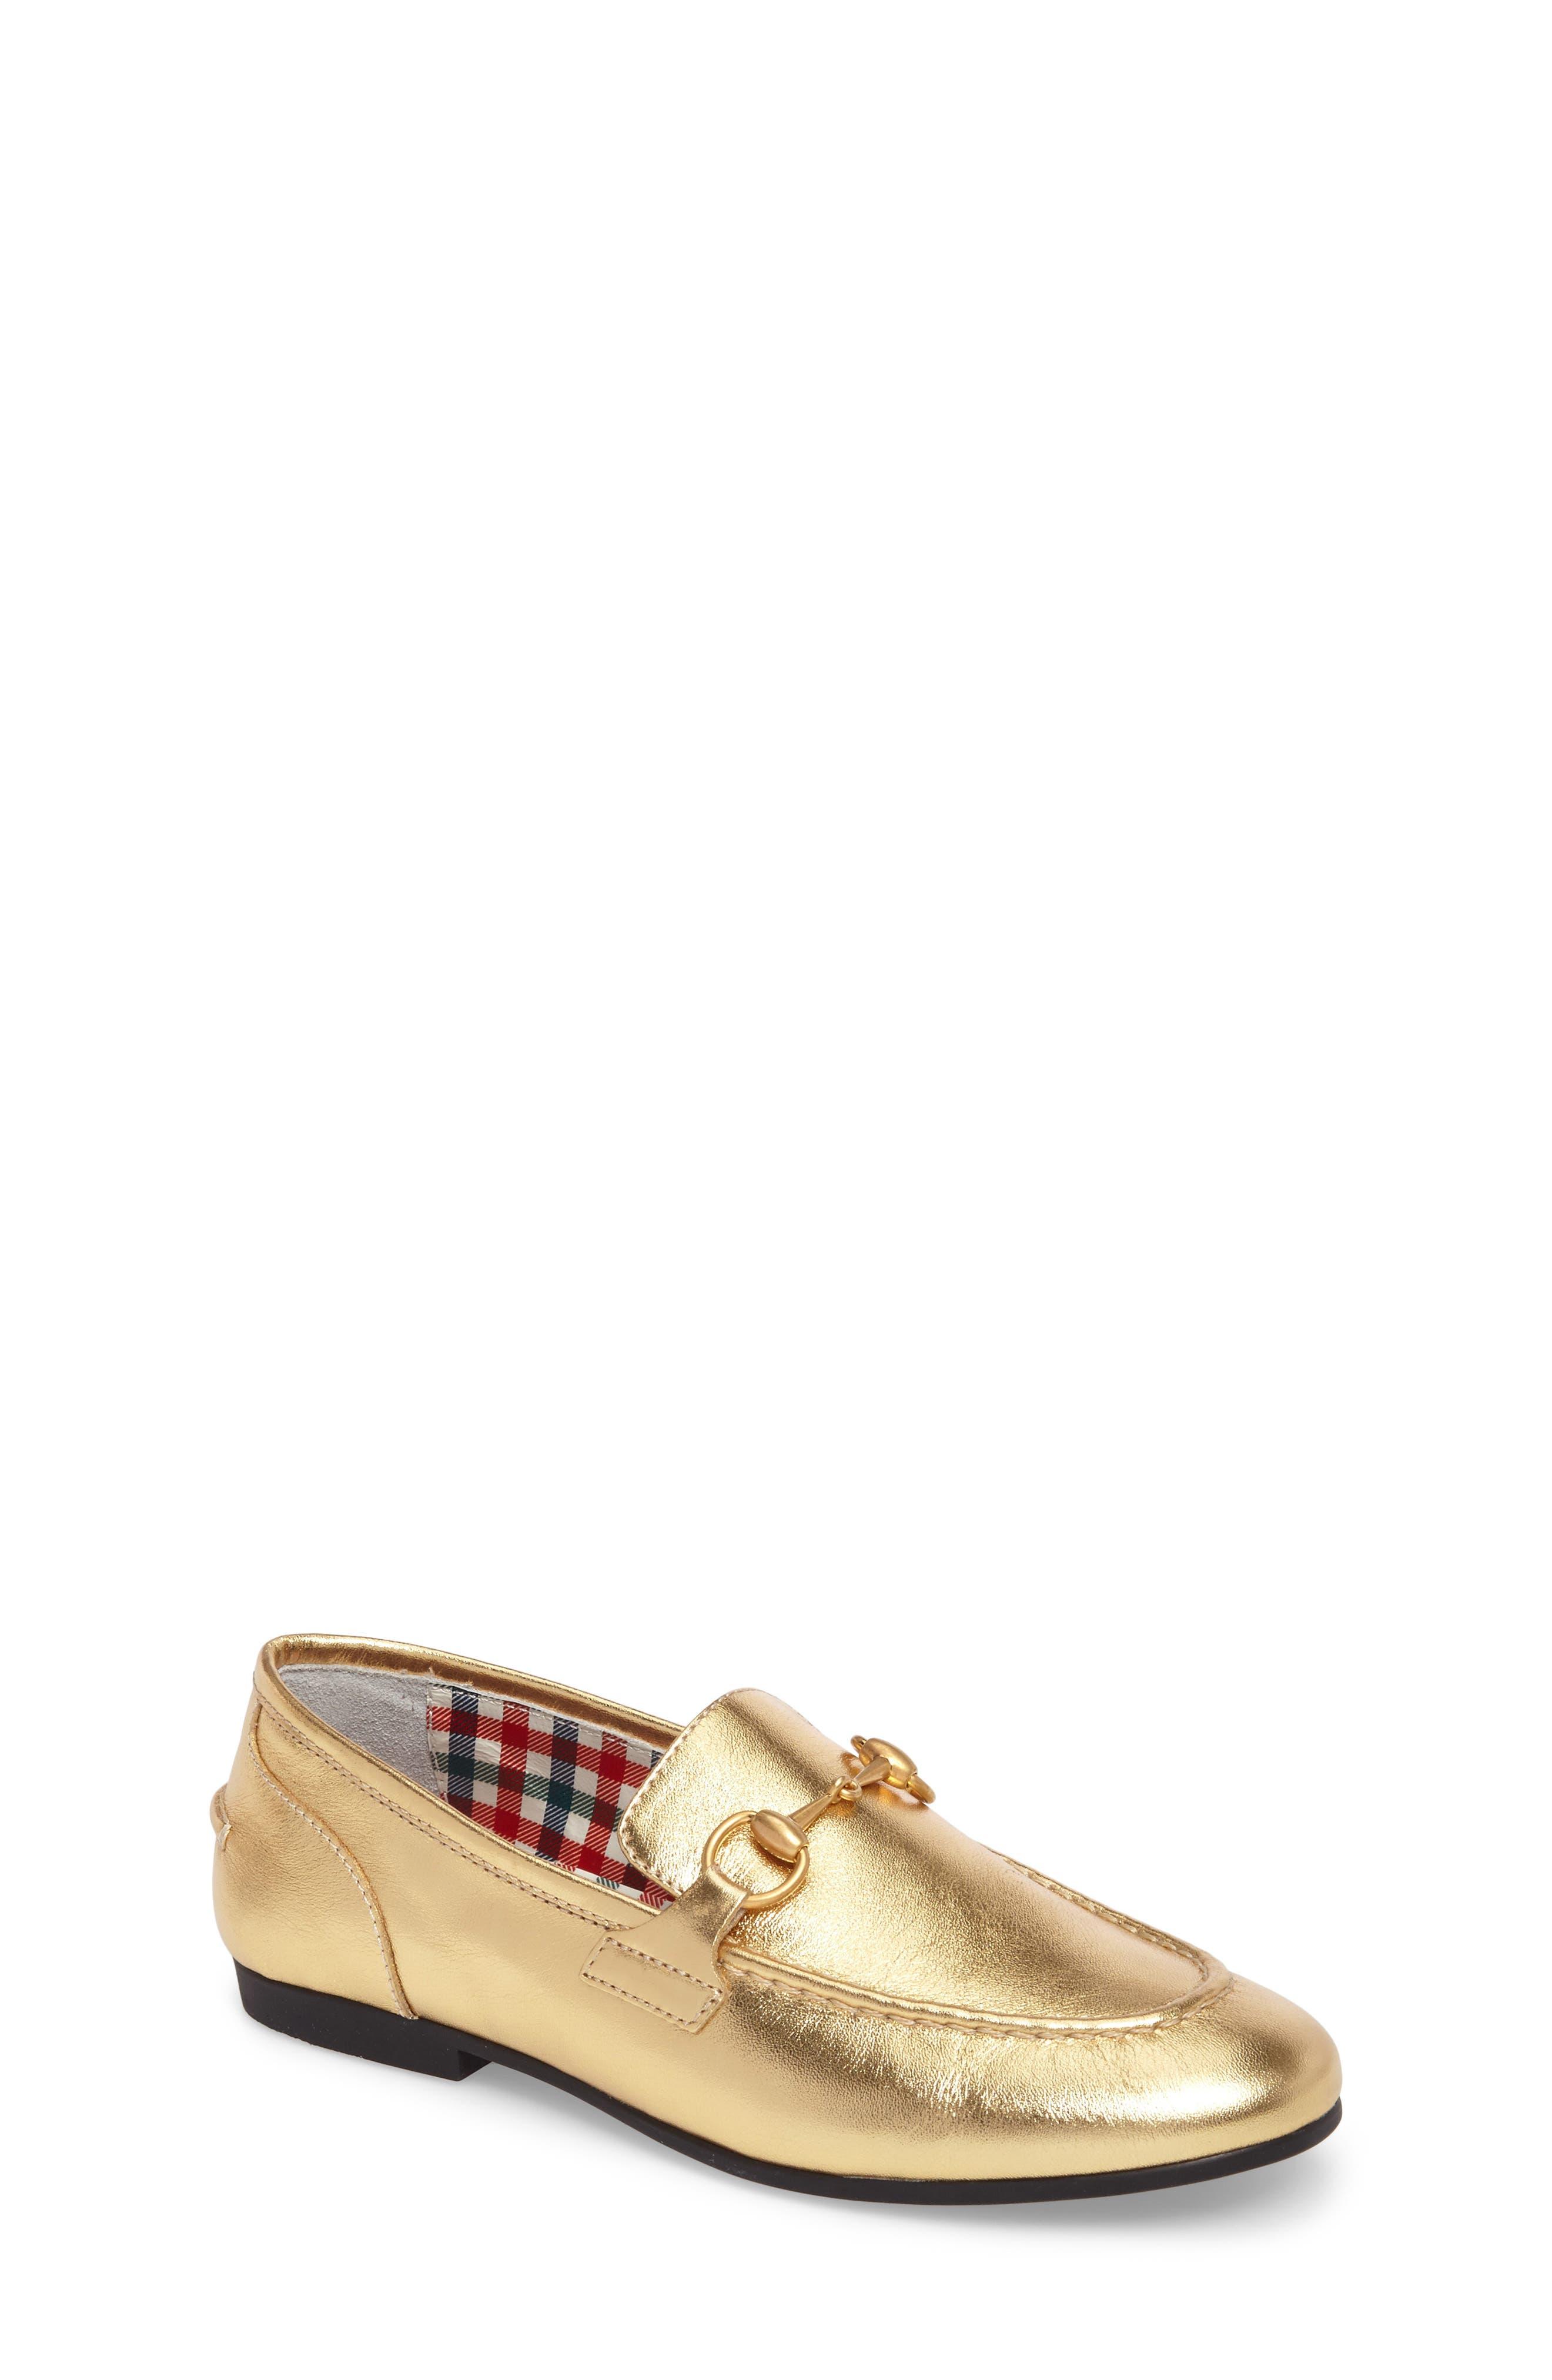 Jordaan Bit Loafer,                             Main thumbnail 1, color,                             METALLIC GOLD